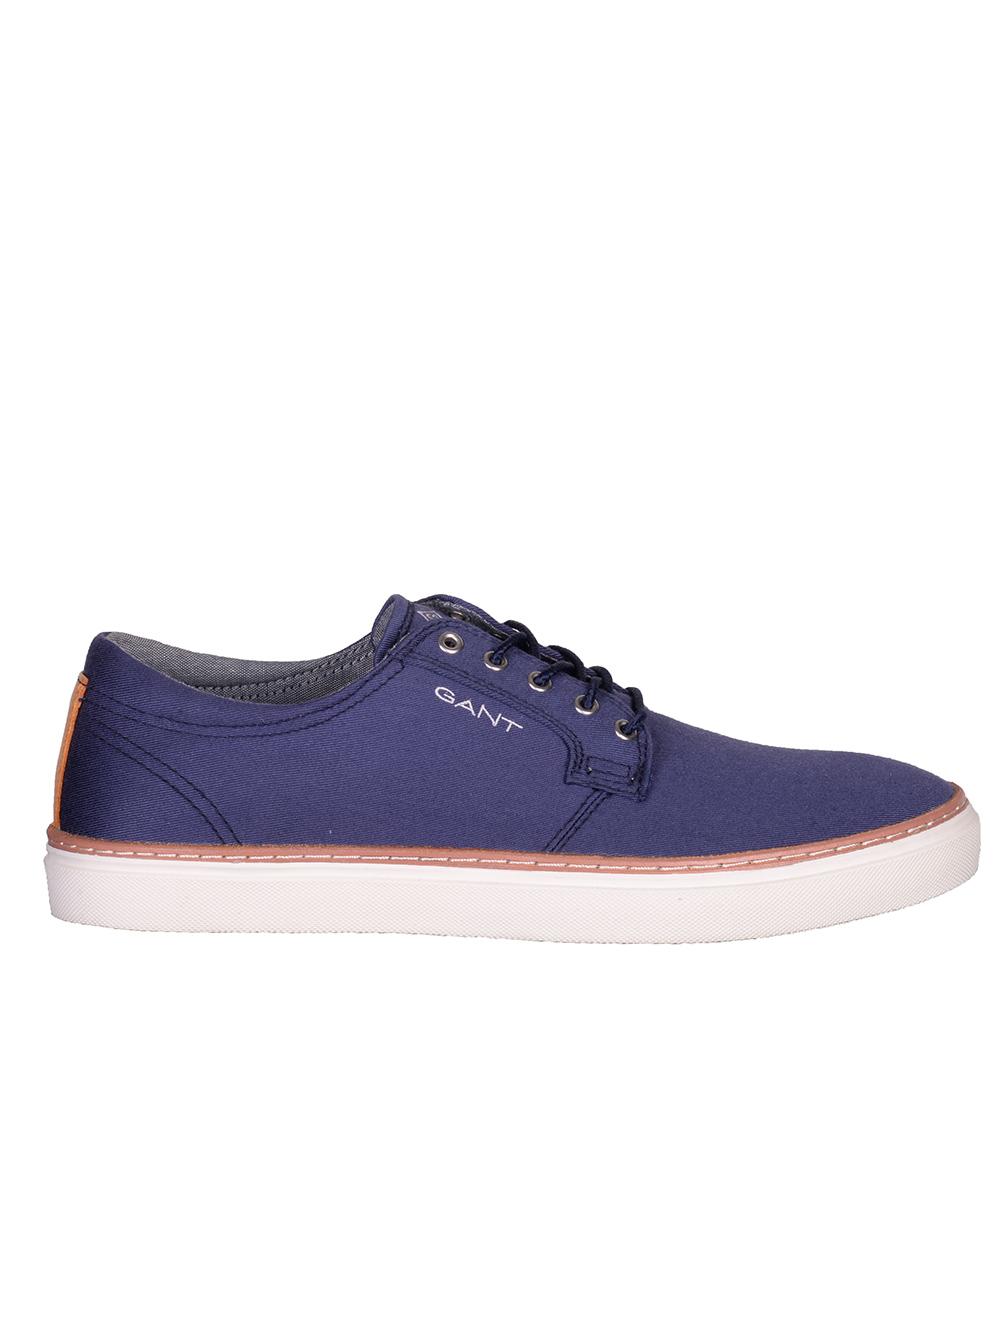 GANT Παπούτσια sneakers 3GS22638666-9 ΜΠΛΕ